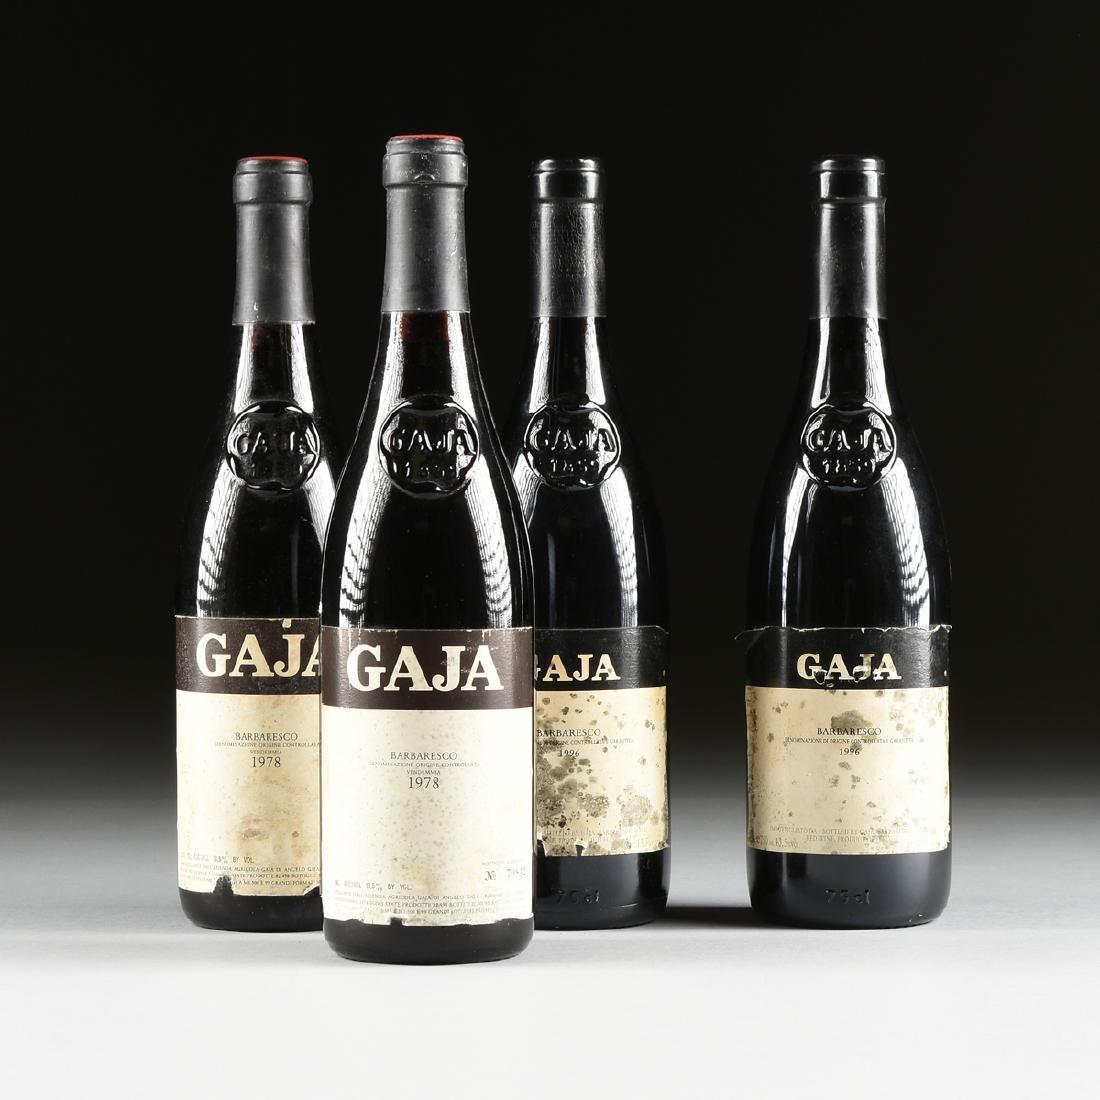 A GROUP OF FOUR BOTTLES OF GAJA BARBARESCO DOCG WINE,